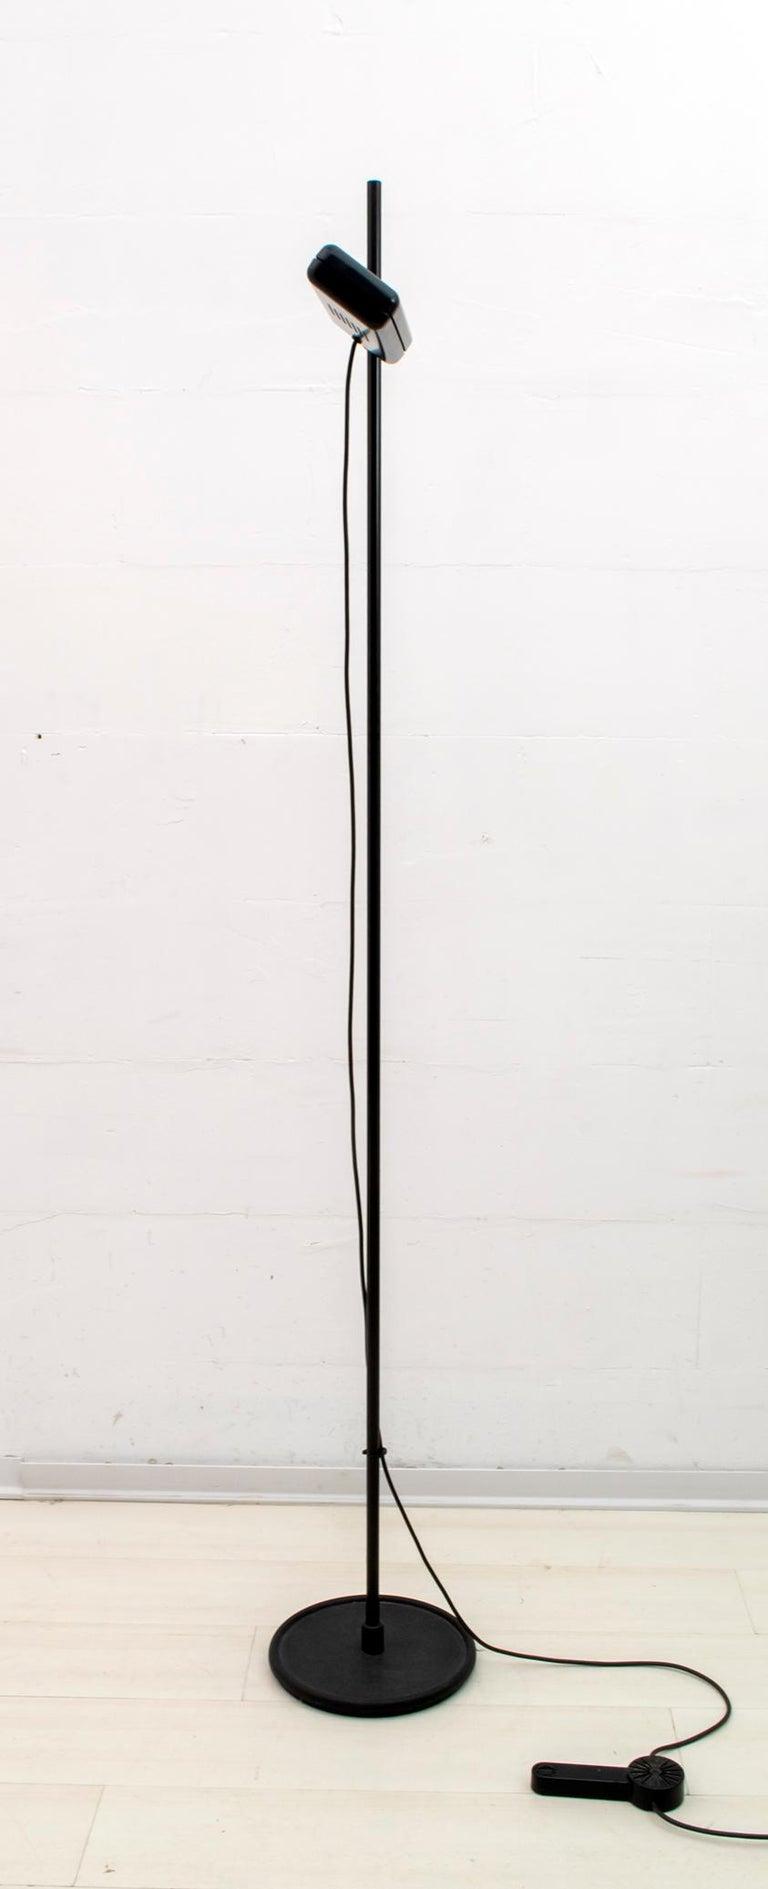 Gianfranco Frattini Postmodern Italian RT3 Floor Lamp for Relco Milano, 1980s In Good Condition For Sale In Cerignola, Italy Puglia